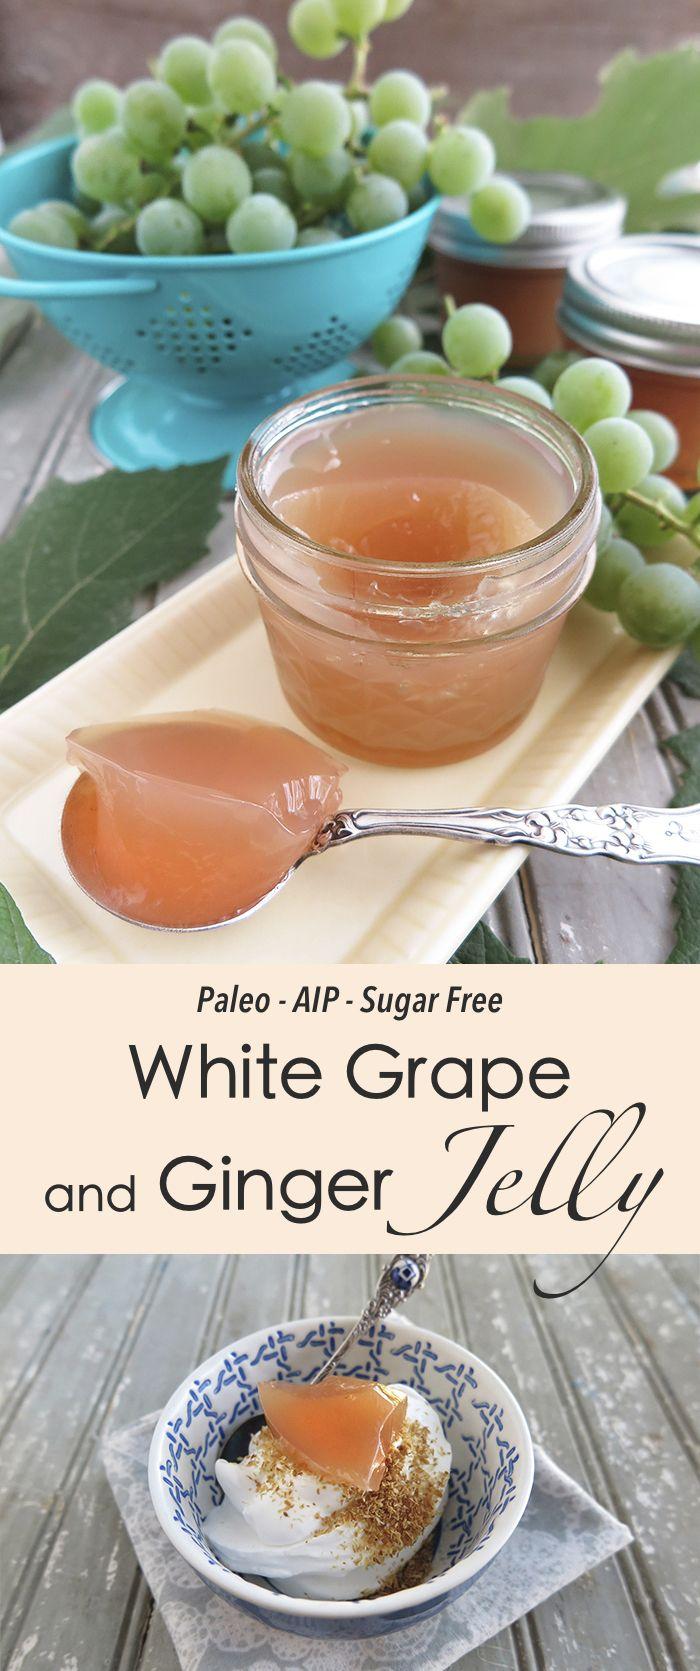 | Sugar Free White Grape and Ginger Jelly with Pomona Pectin (Paleo, AIP)…